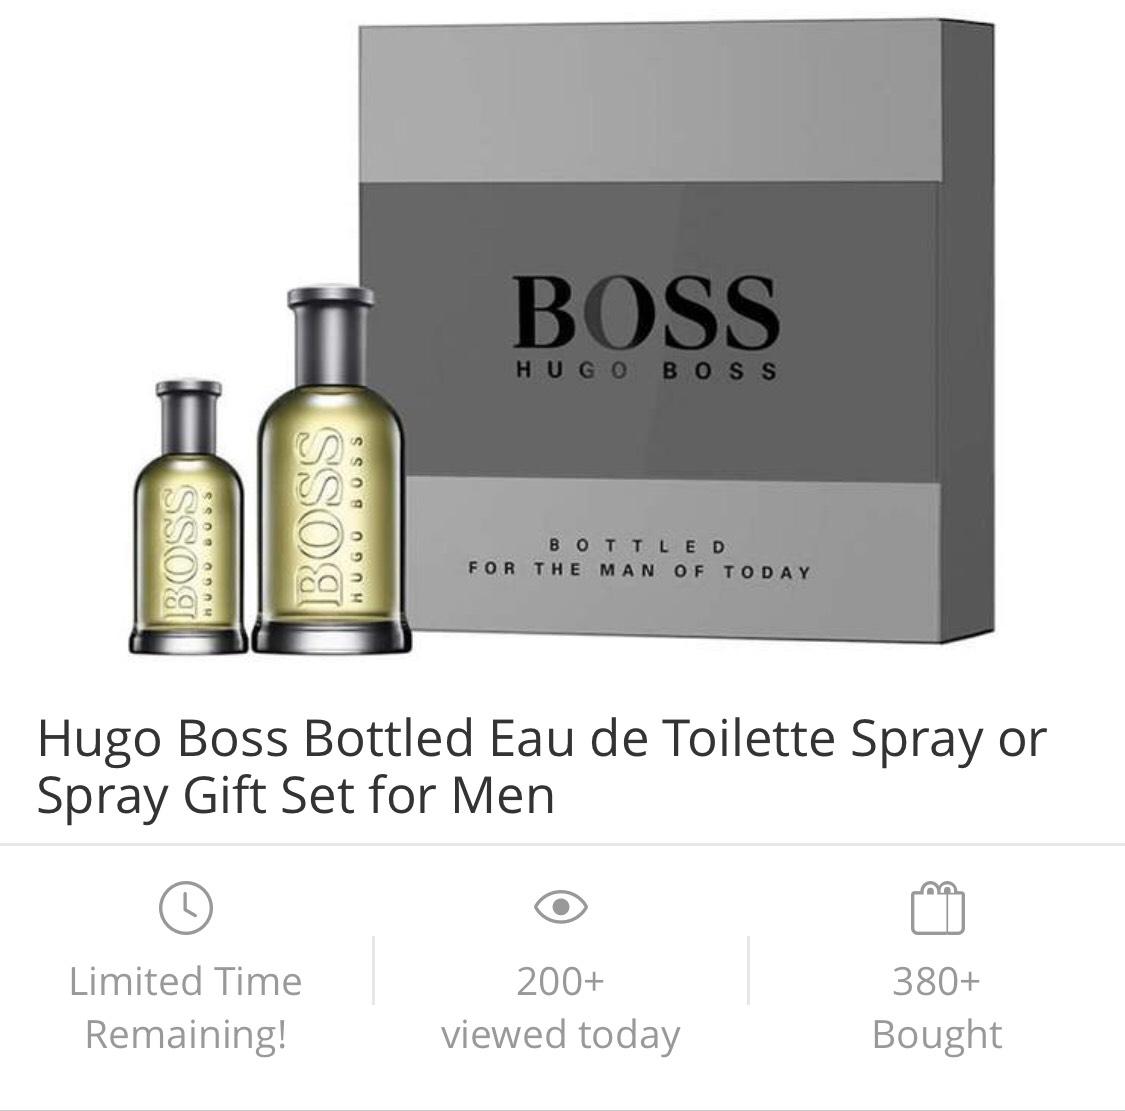 Hugo Boss Bottled Eau de toilette 30ml & 100ml  £53.97 delivered @ Groupon